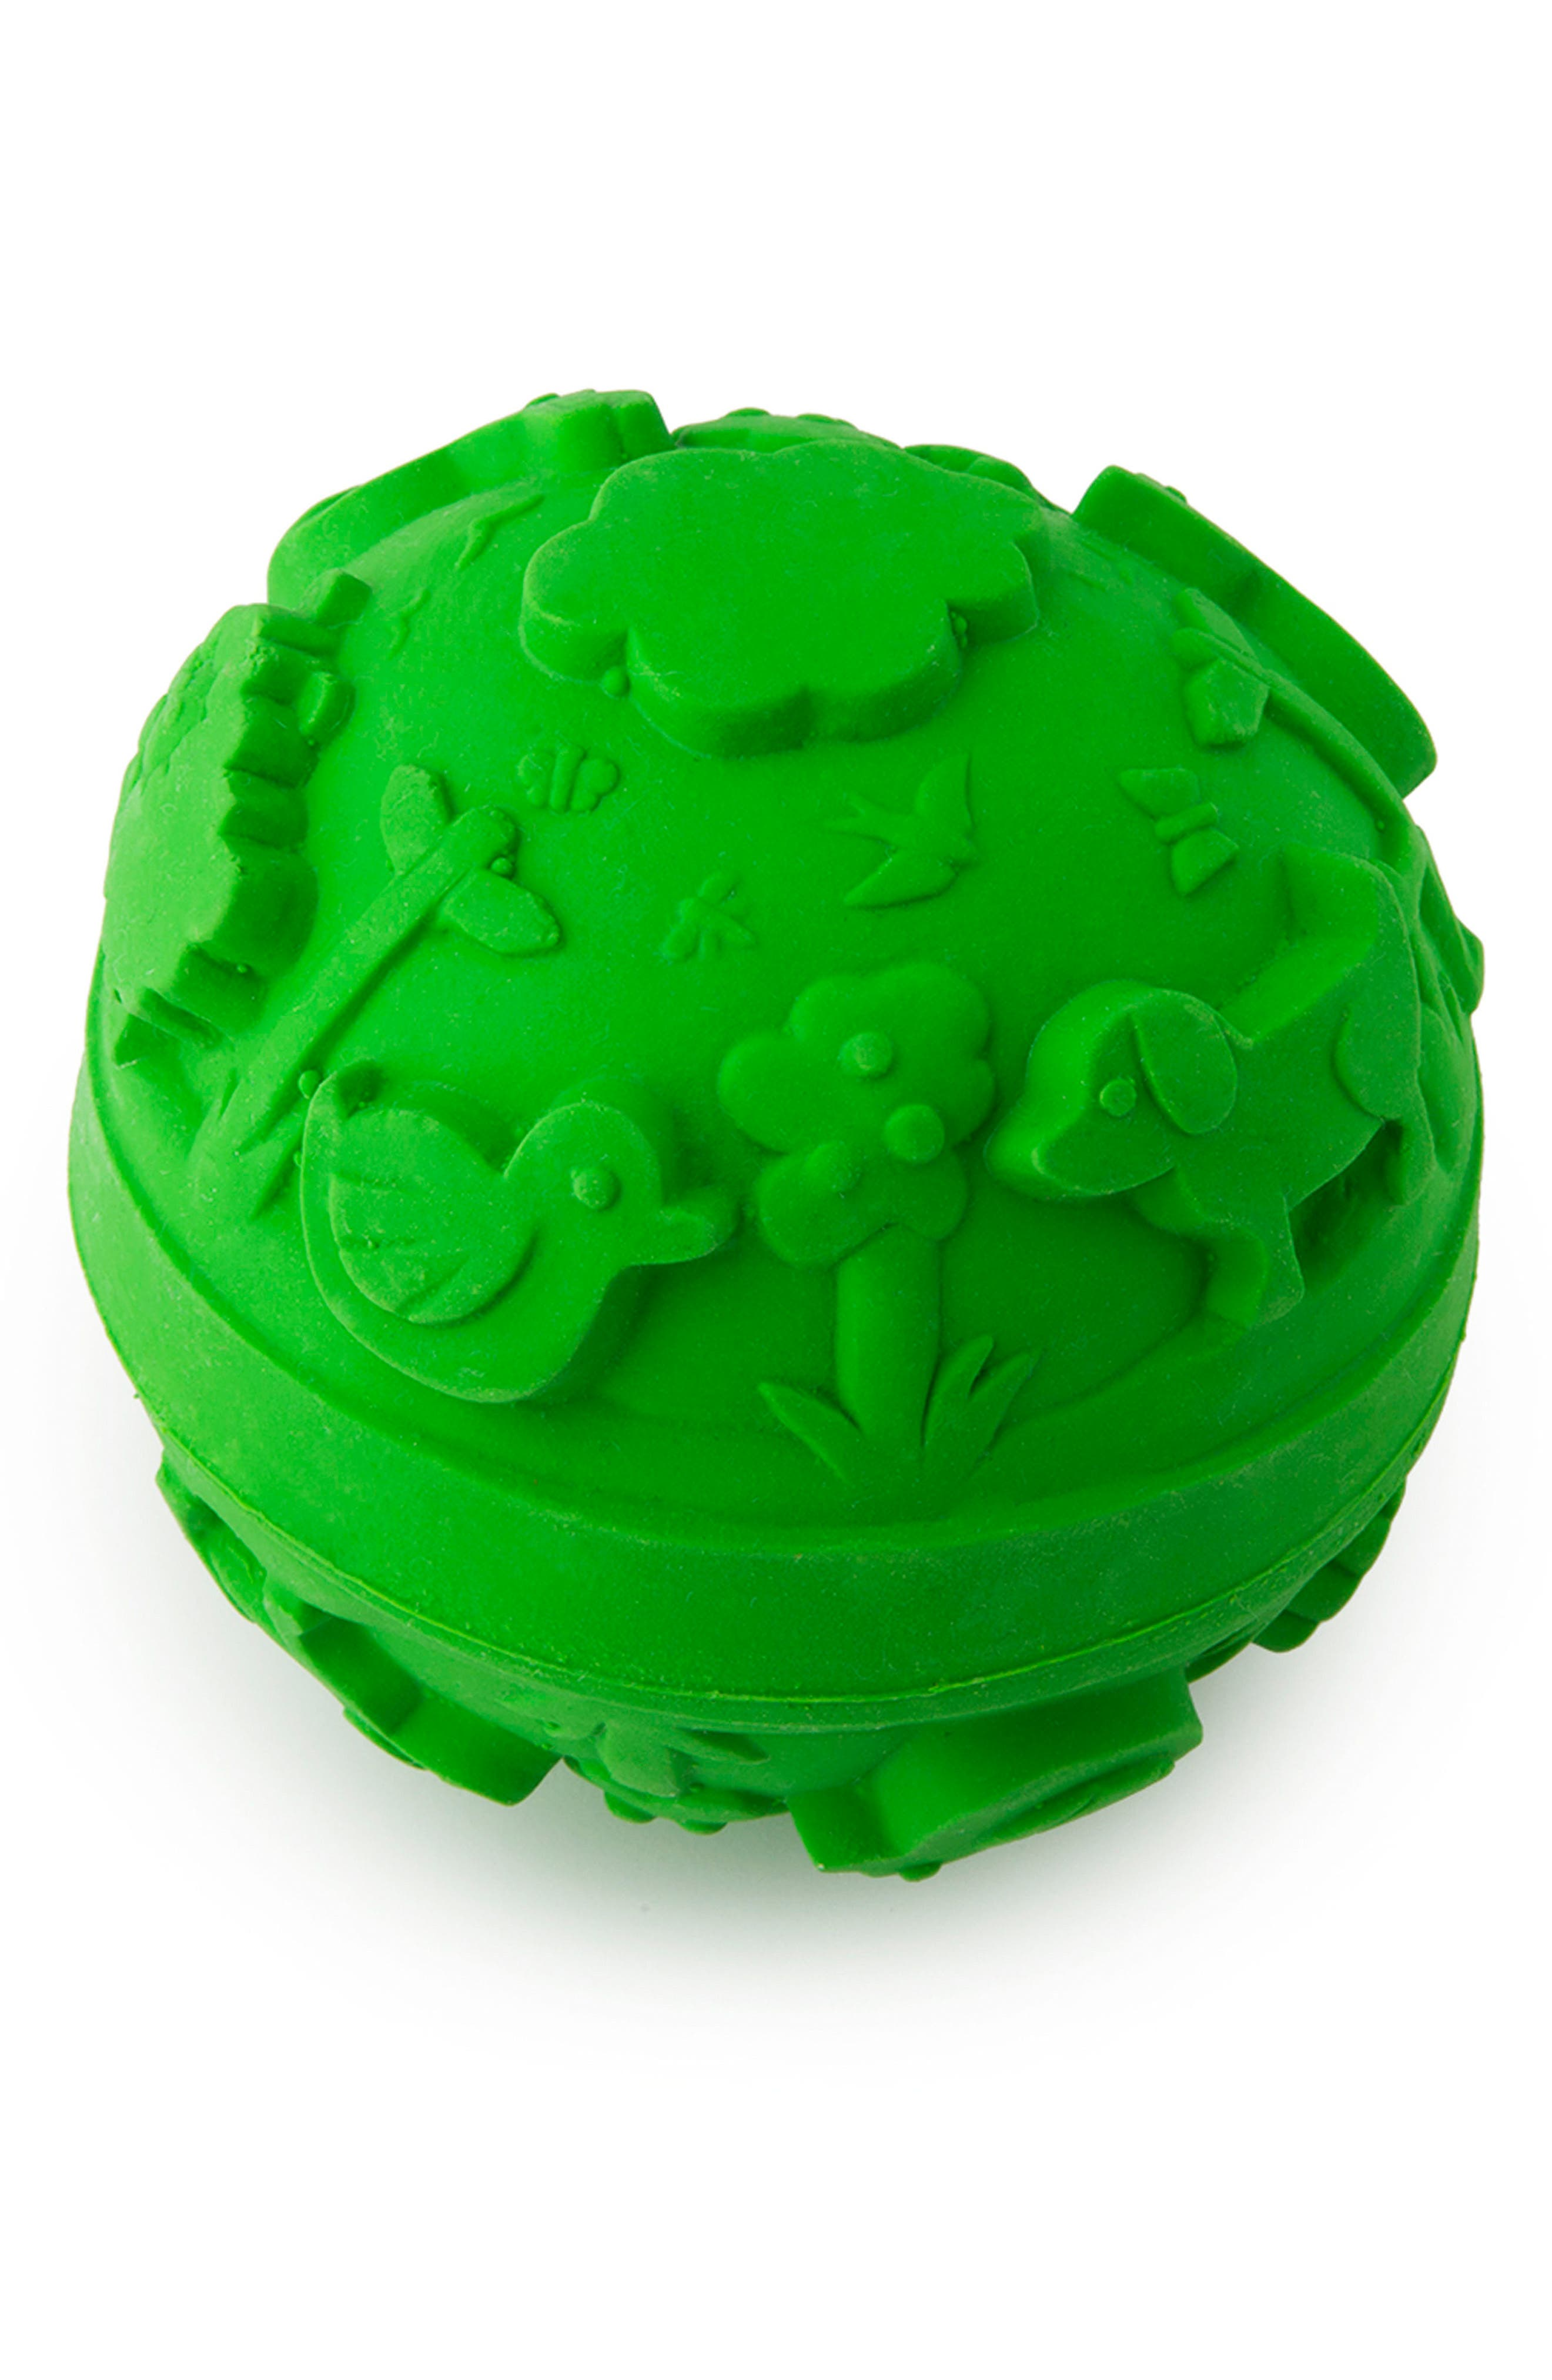 Oli and Carol Baby Ball Teething Toy,                             Main thumbnail 1, color,                             300